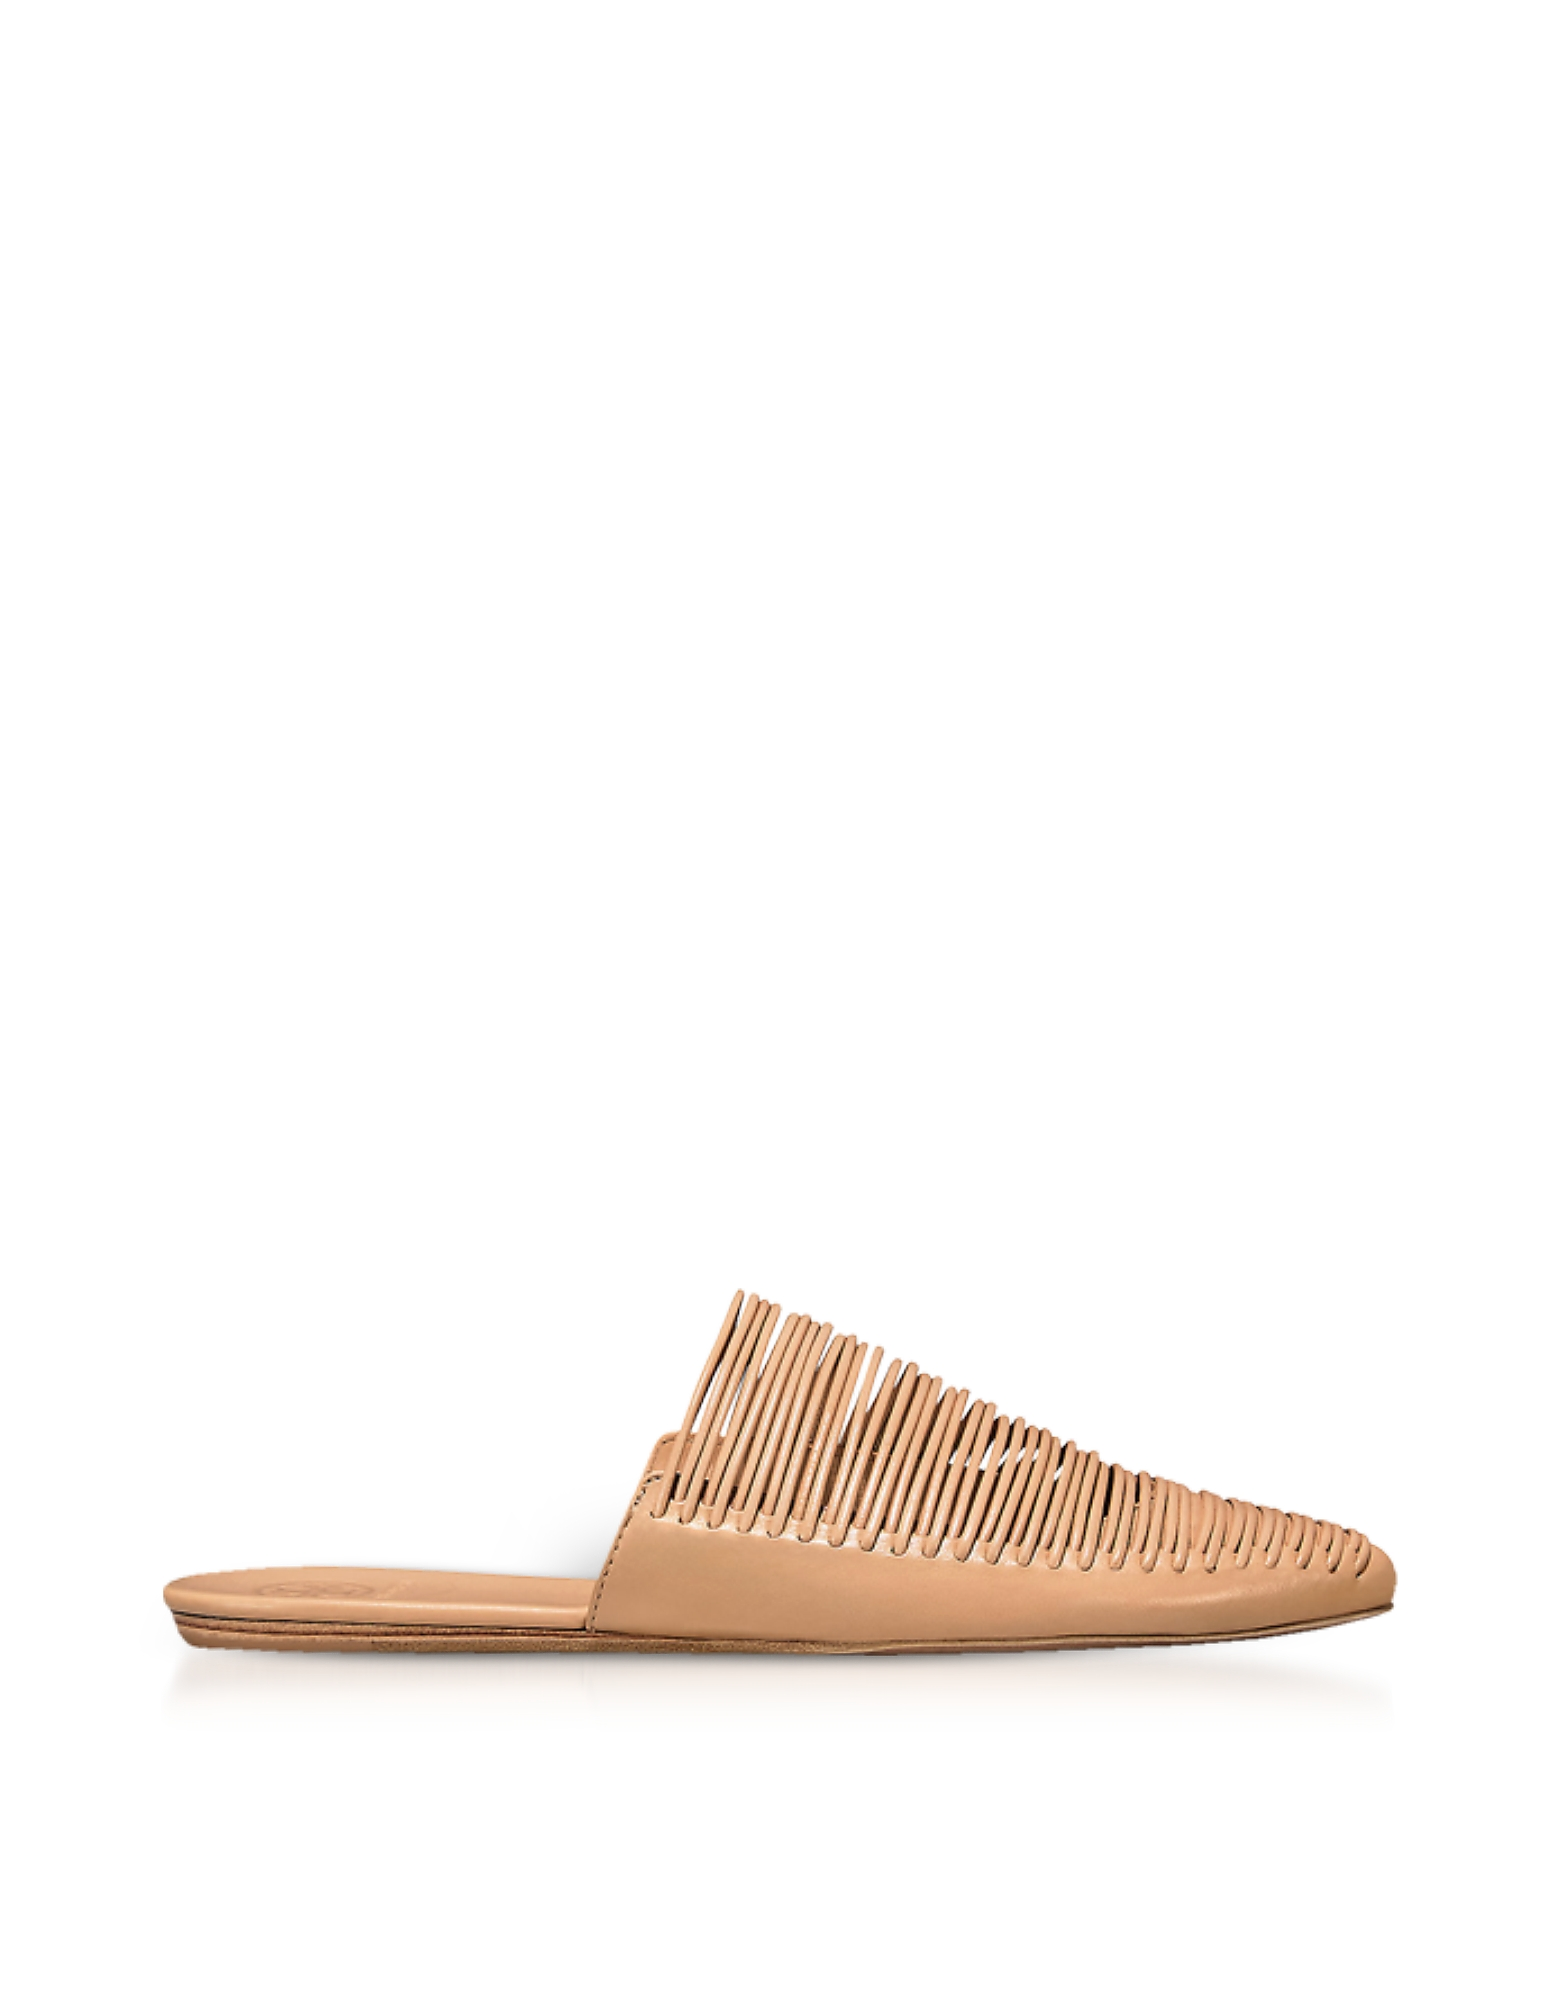 Natual Leather Sienna Flat Slide Mules